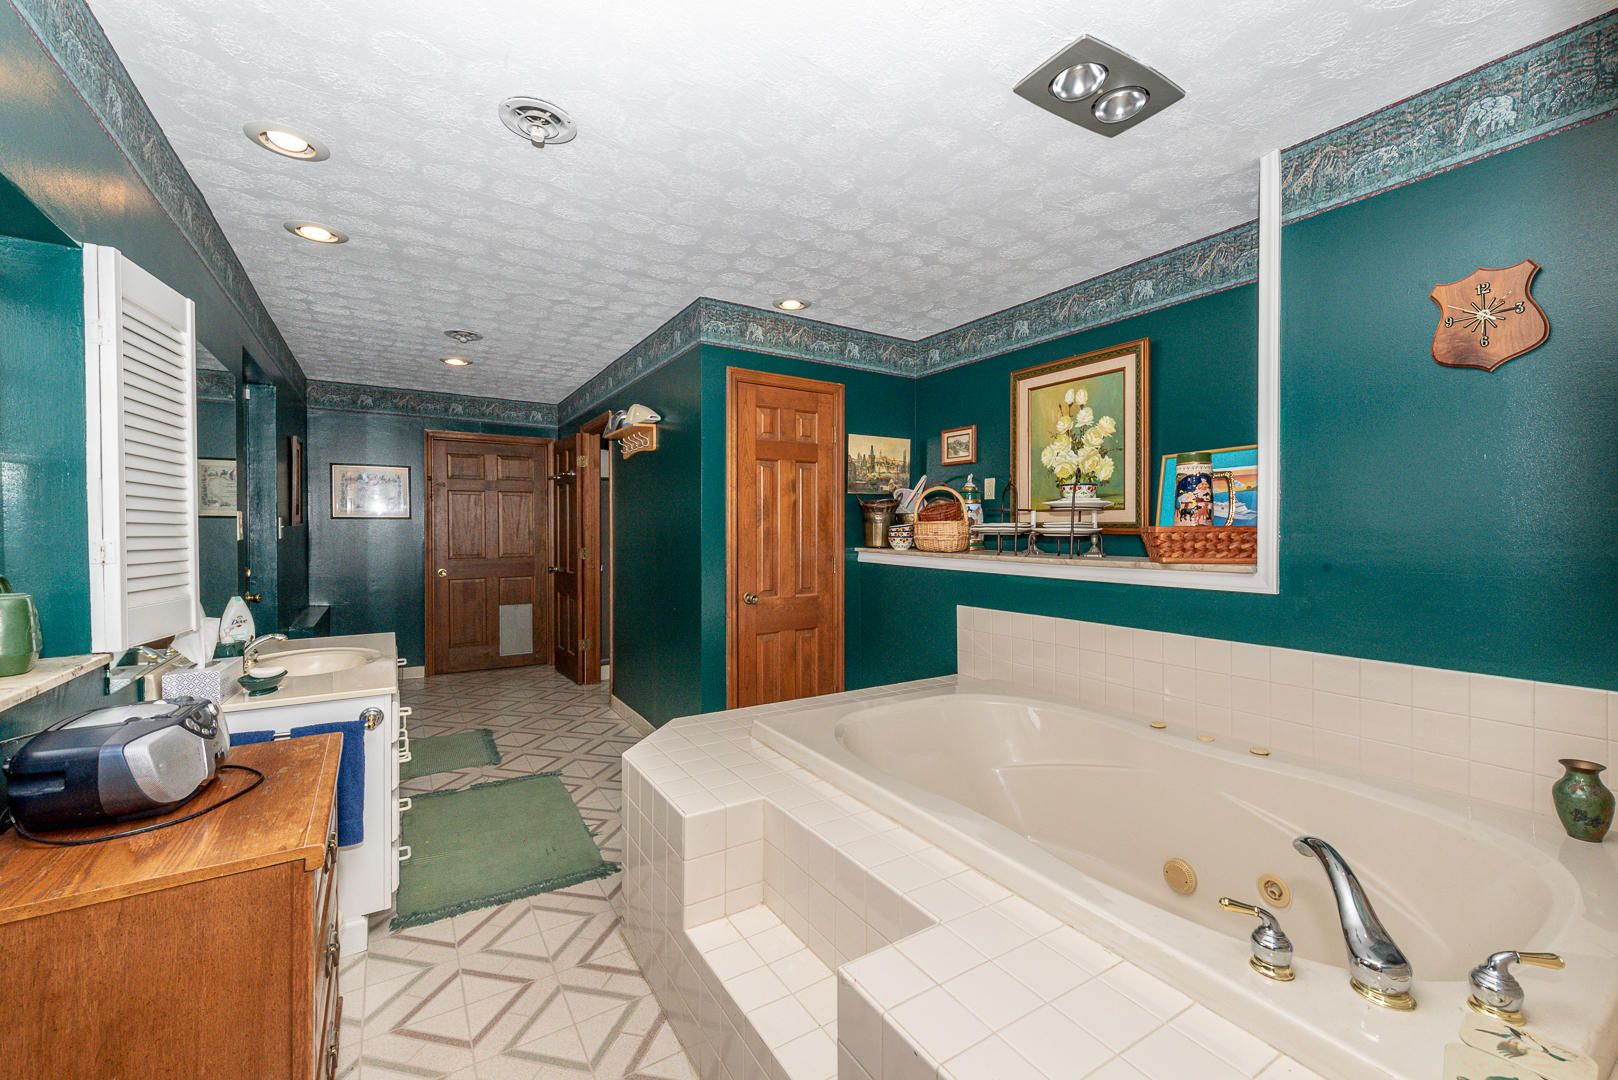 Downstairs bath/mudroom